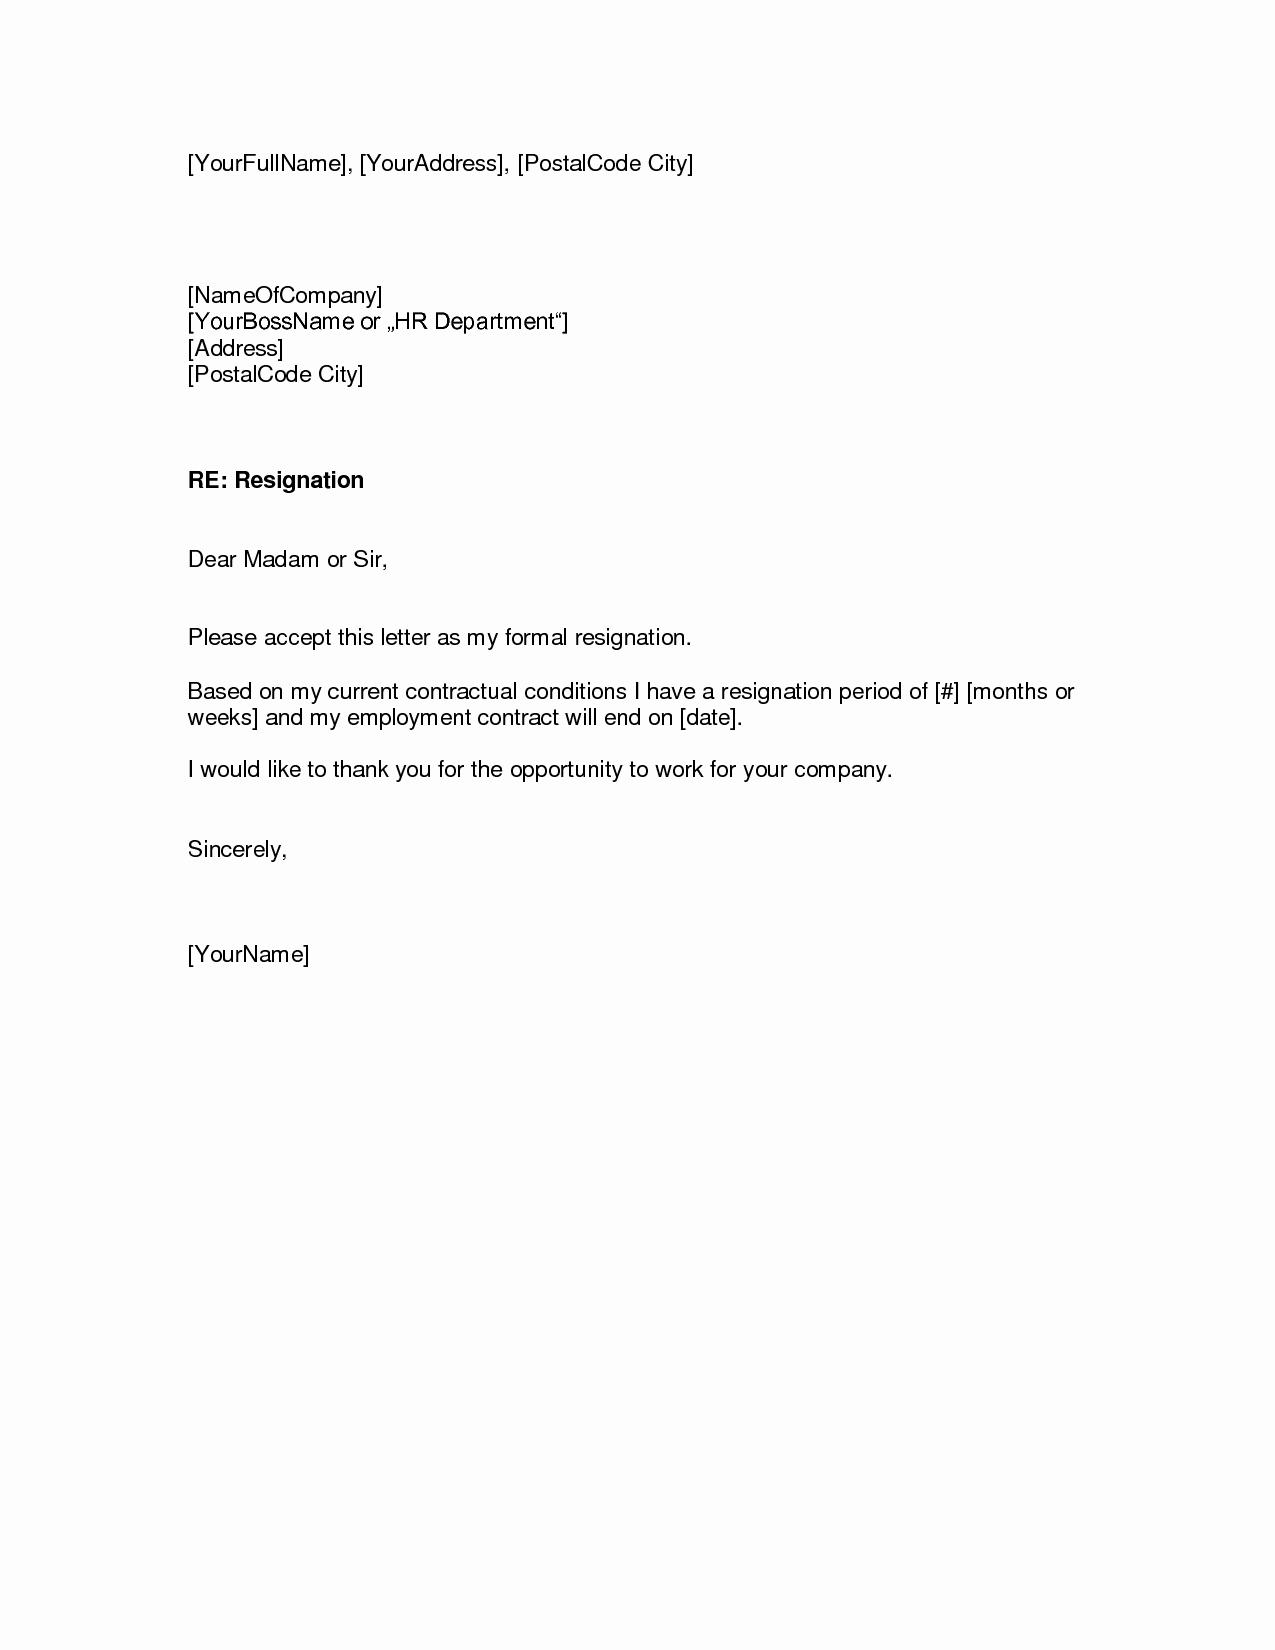 Resignation Letter Sample Unique Download Resignation Letters Pdf & Doc